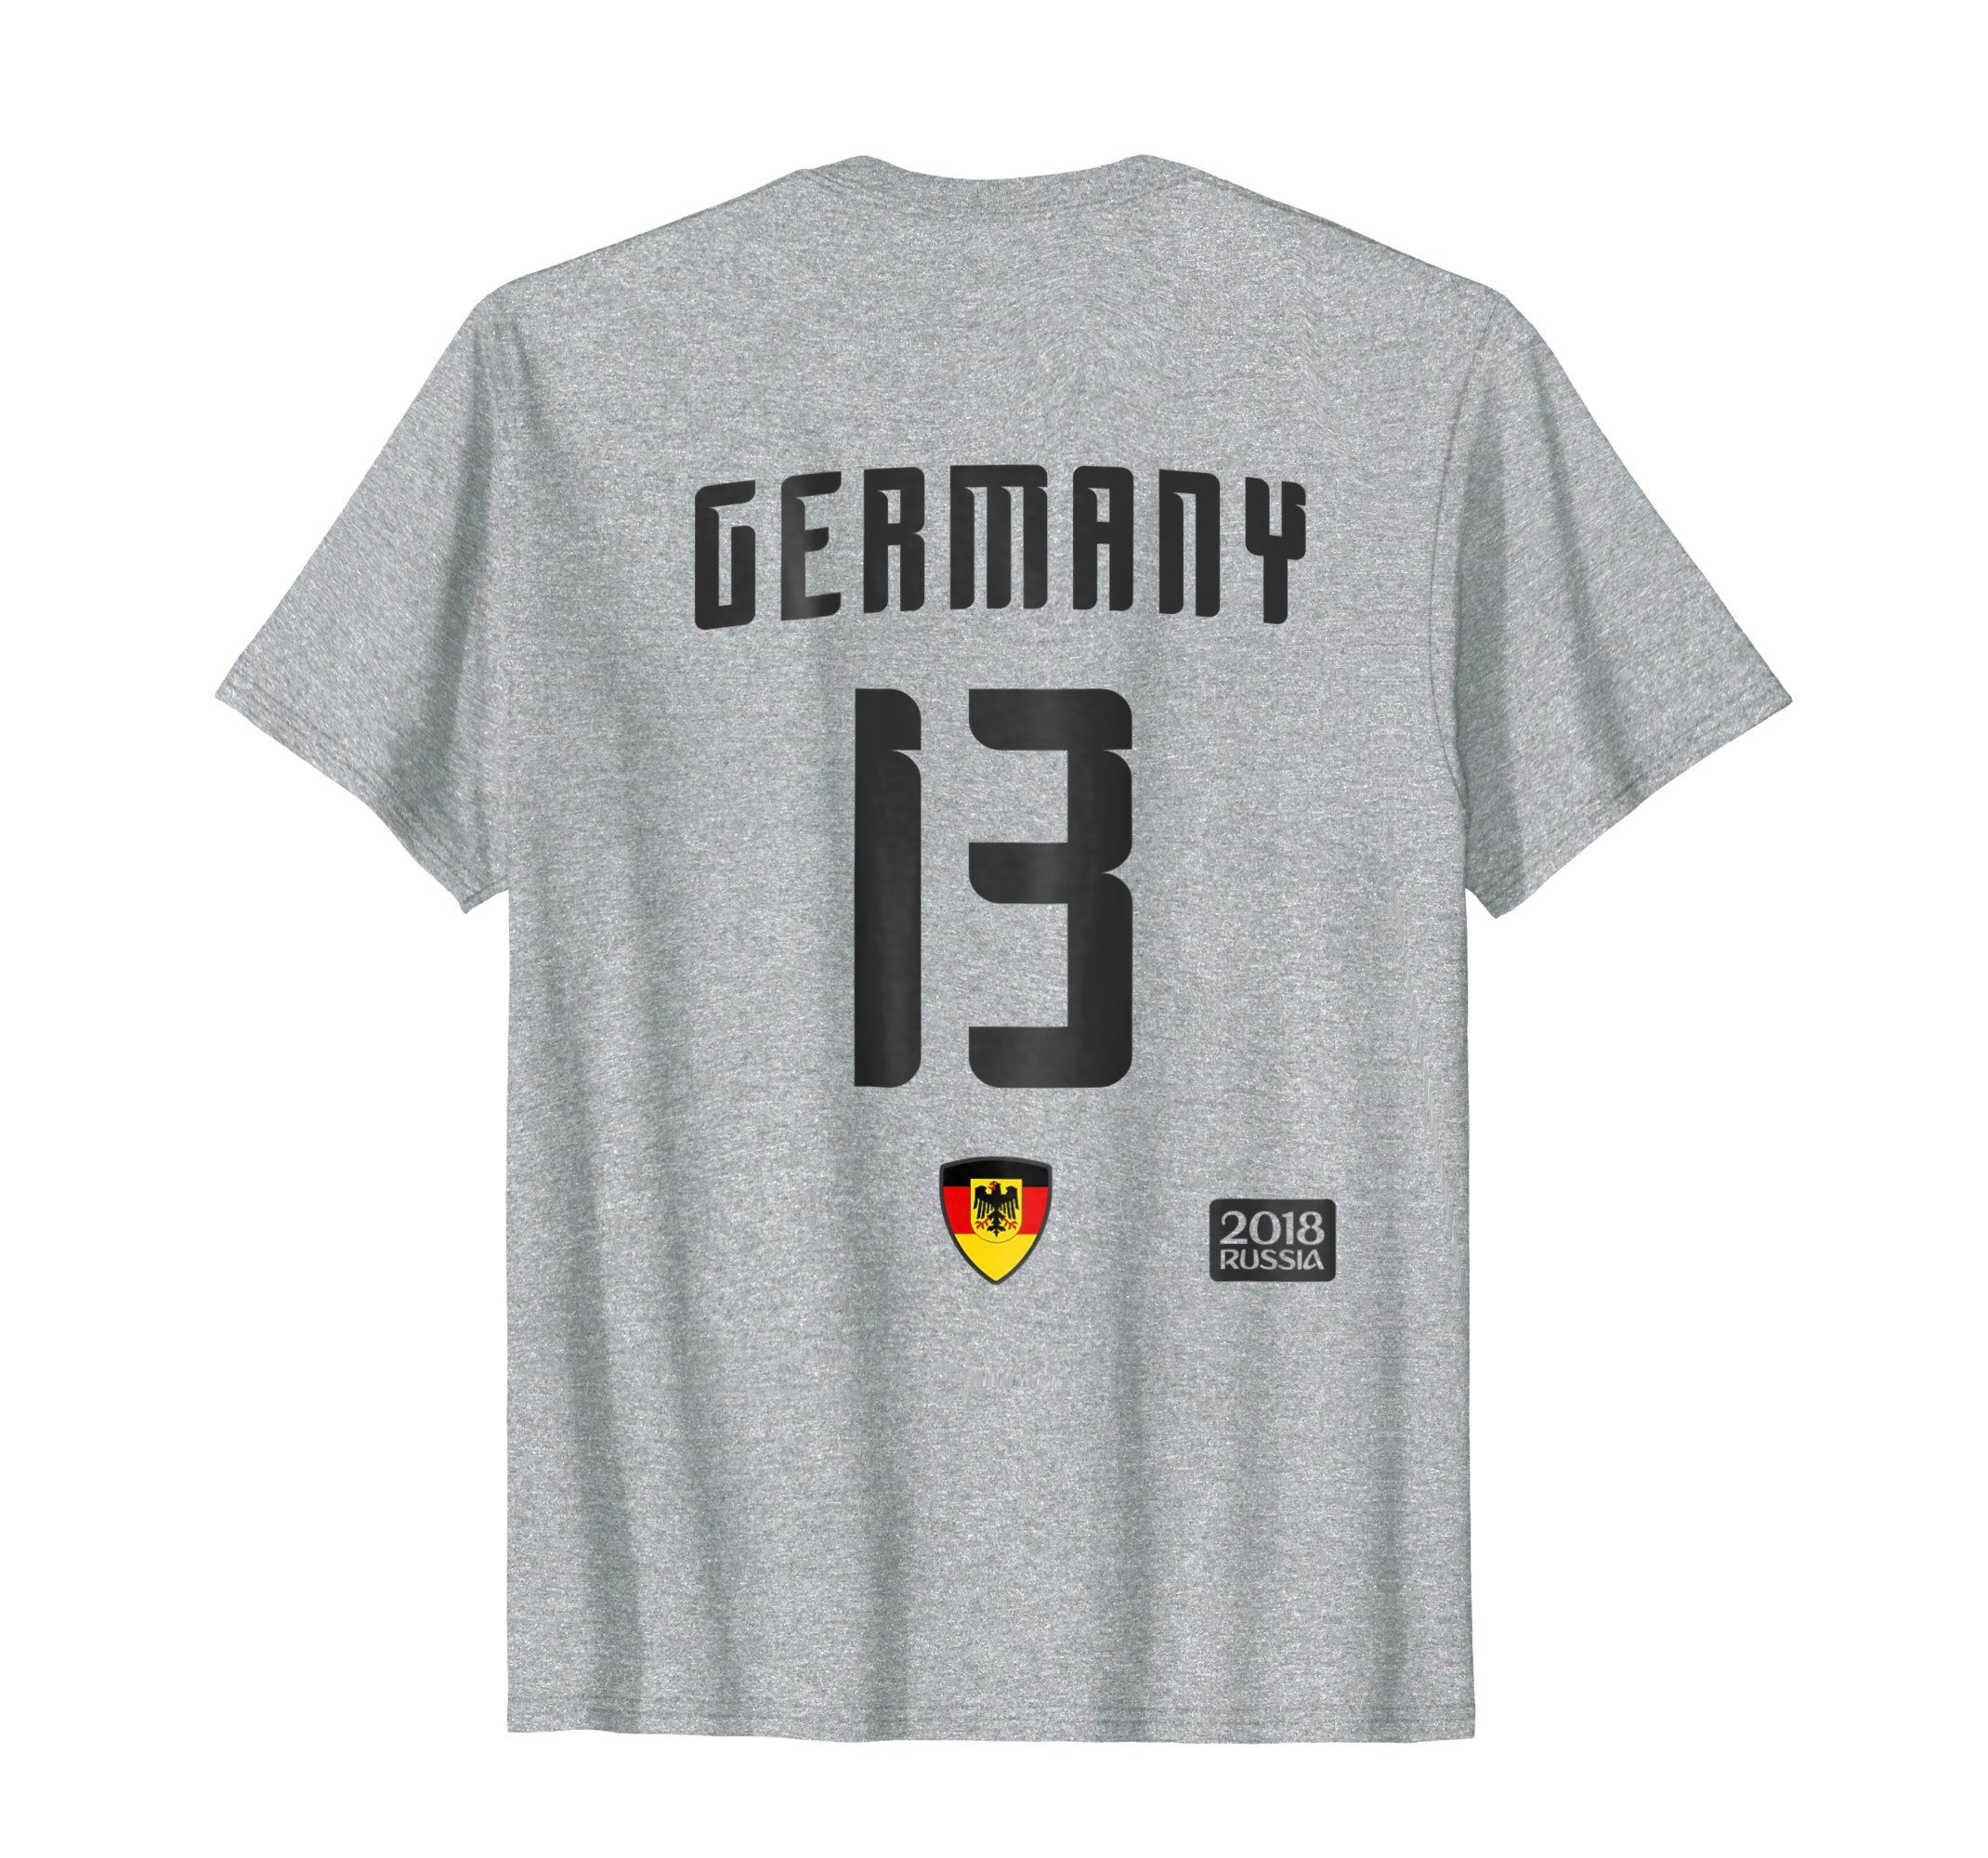 2062f023c Amazon.com: Germany 13 White Soccer T-Shirt - Football 2018 Team Jersey:  Clothing